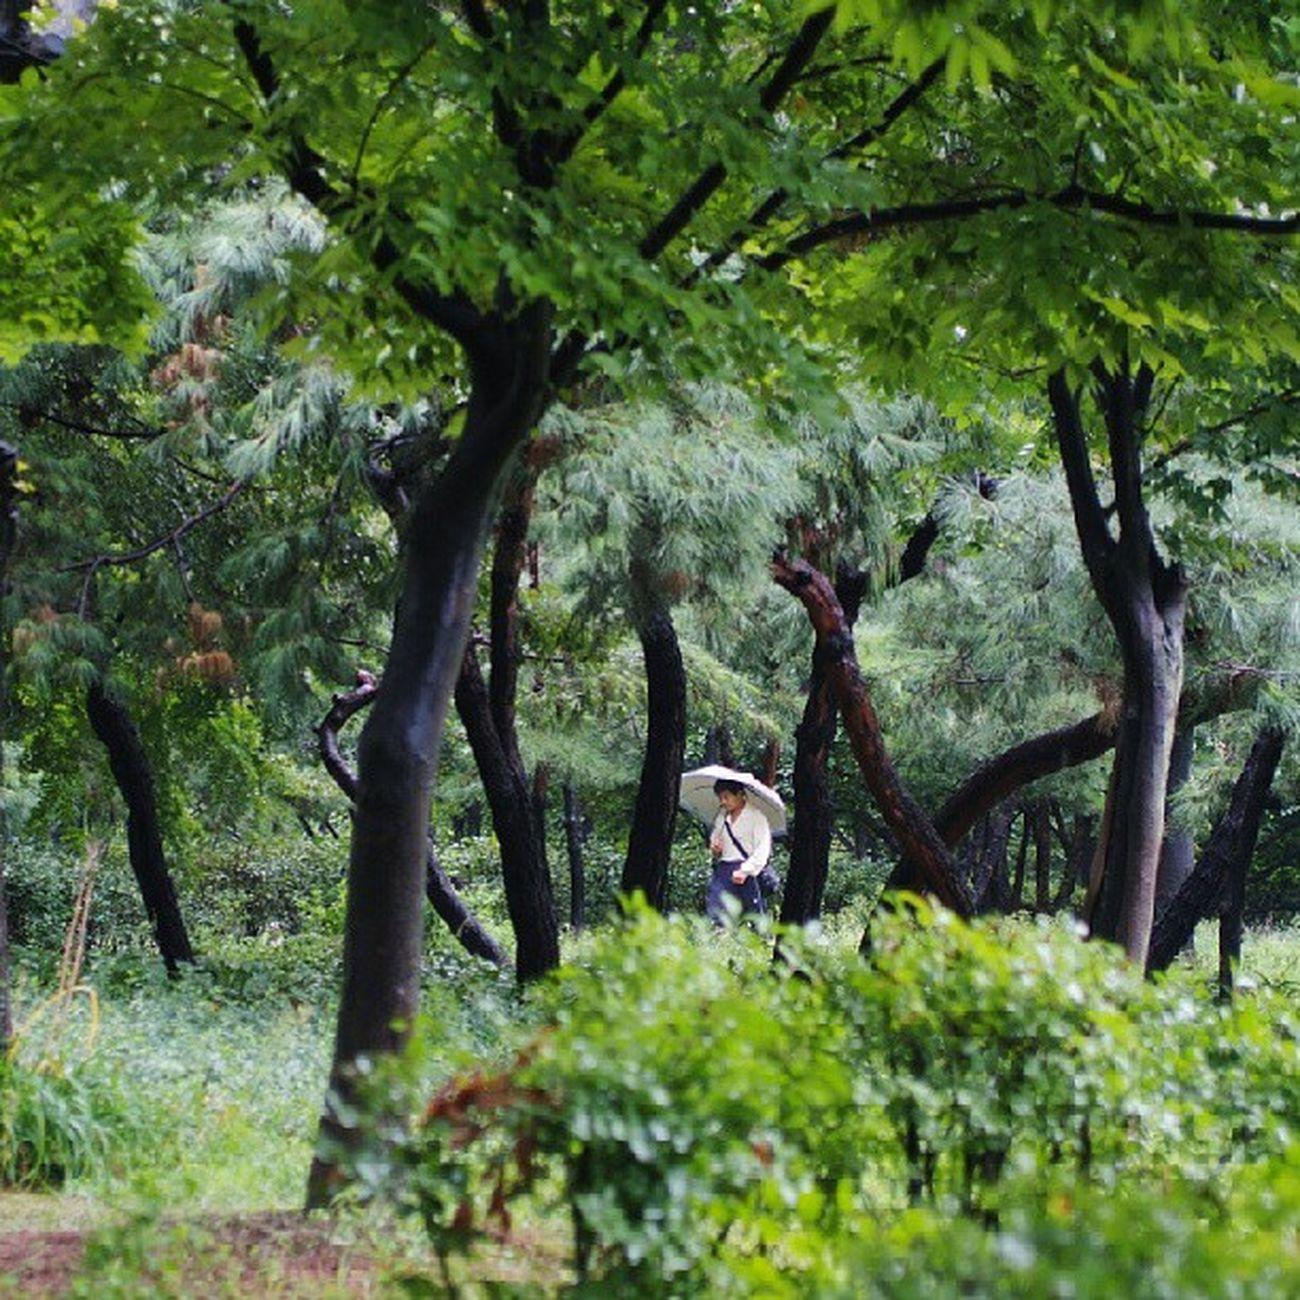 Robin_theme15 Walking in the rain 소녀같은 비가 어깨를 톡톡 가리봉동